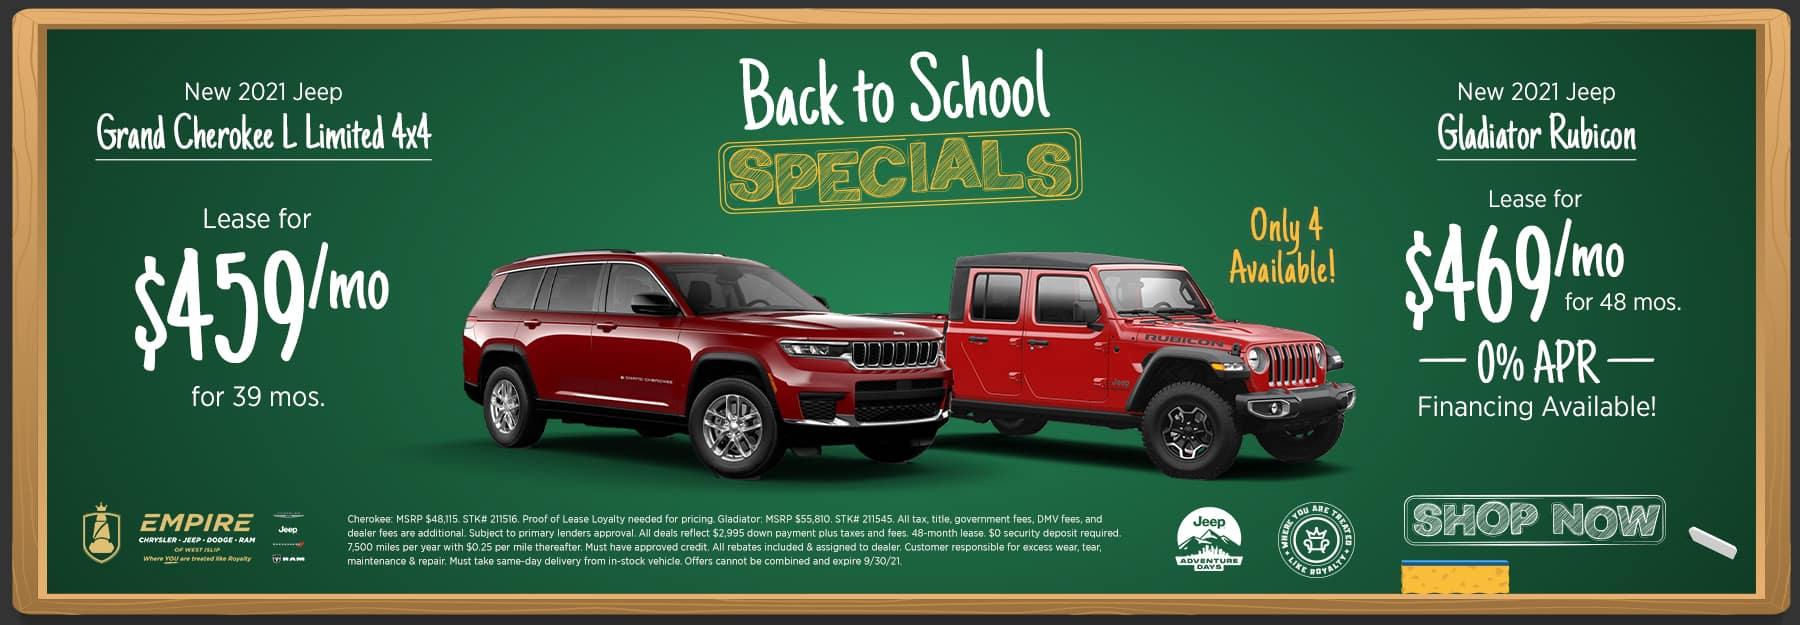 ECJDR-WEB-090921-BackToSchool-Jeep-1